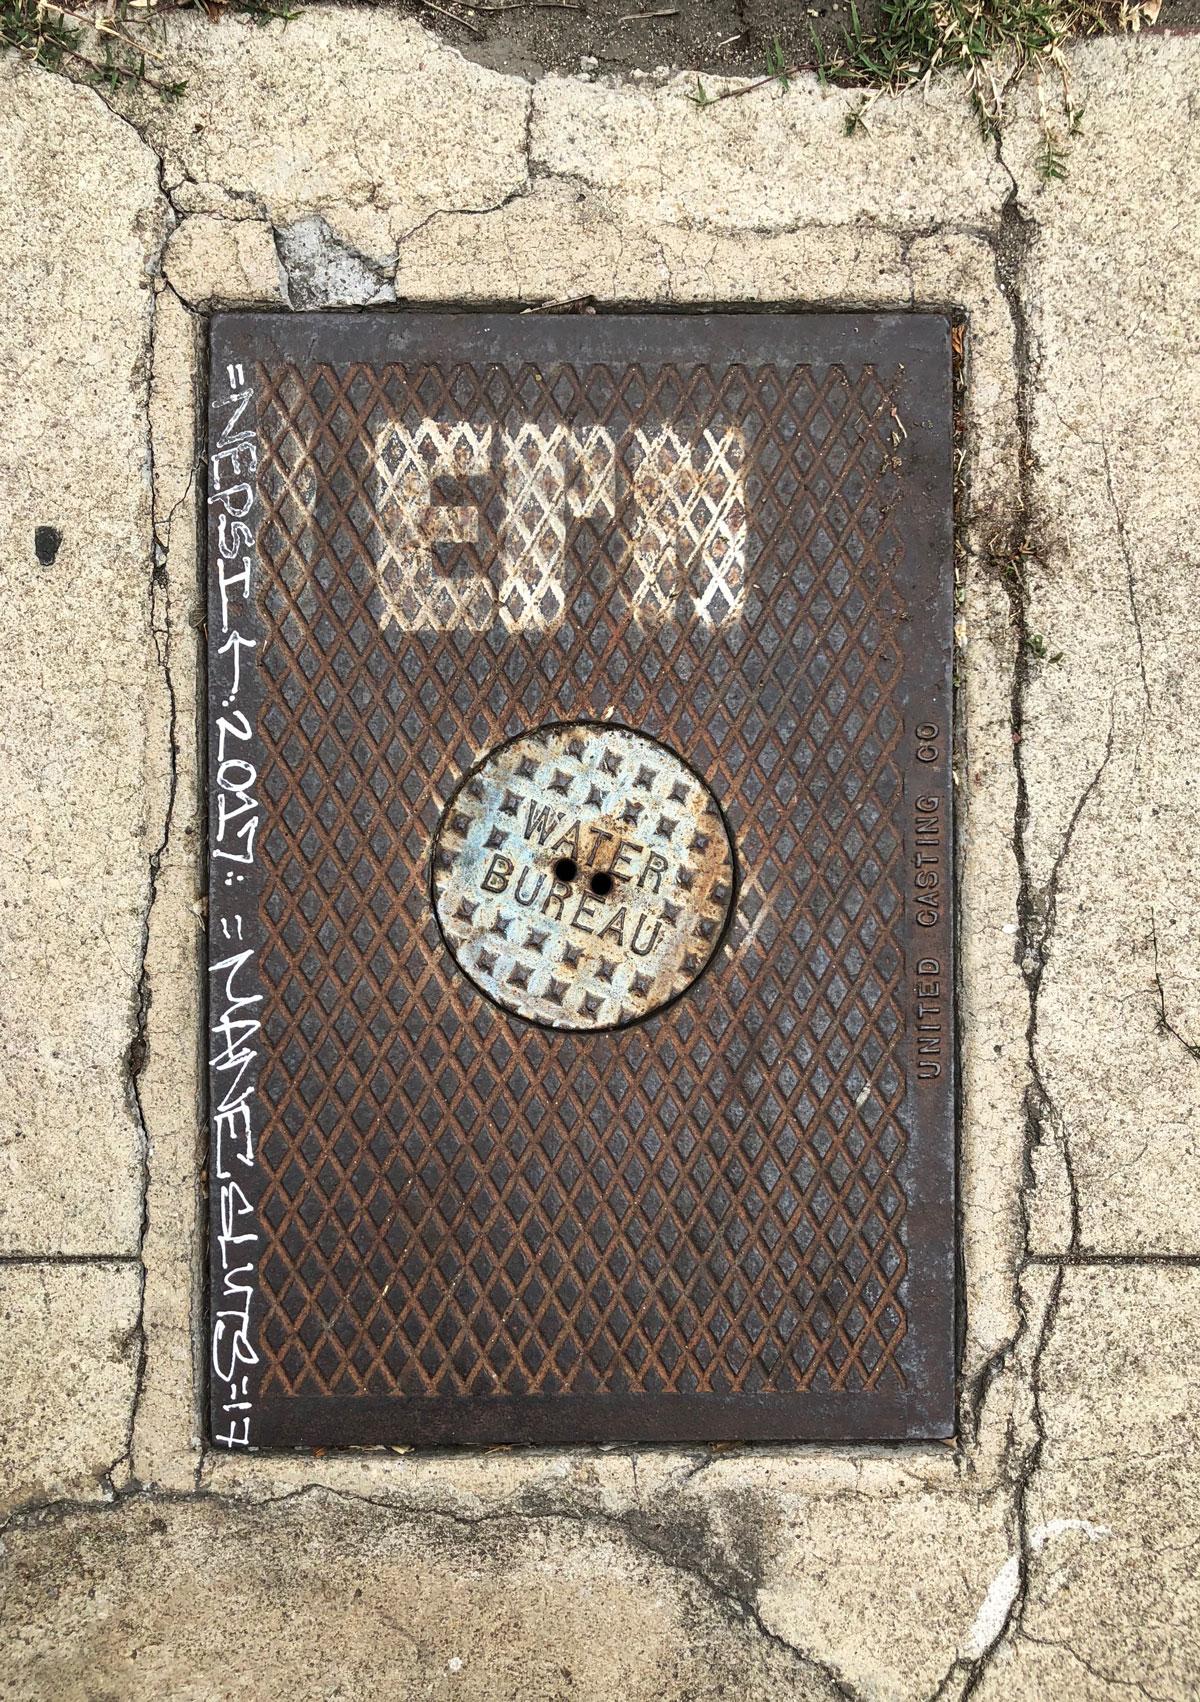 epn water bureau